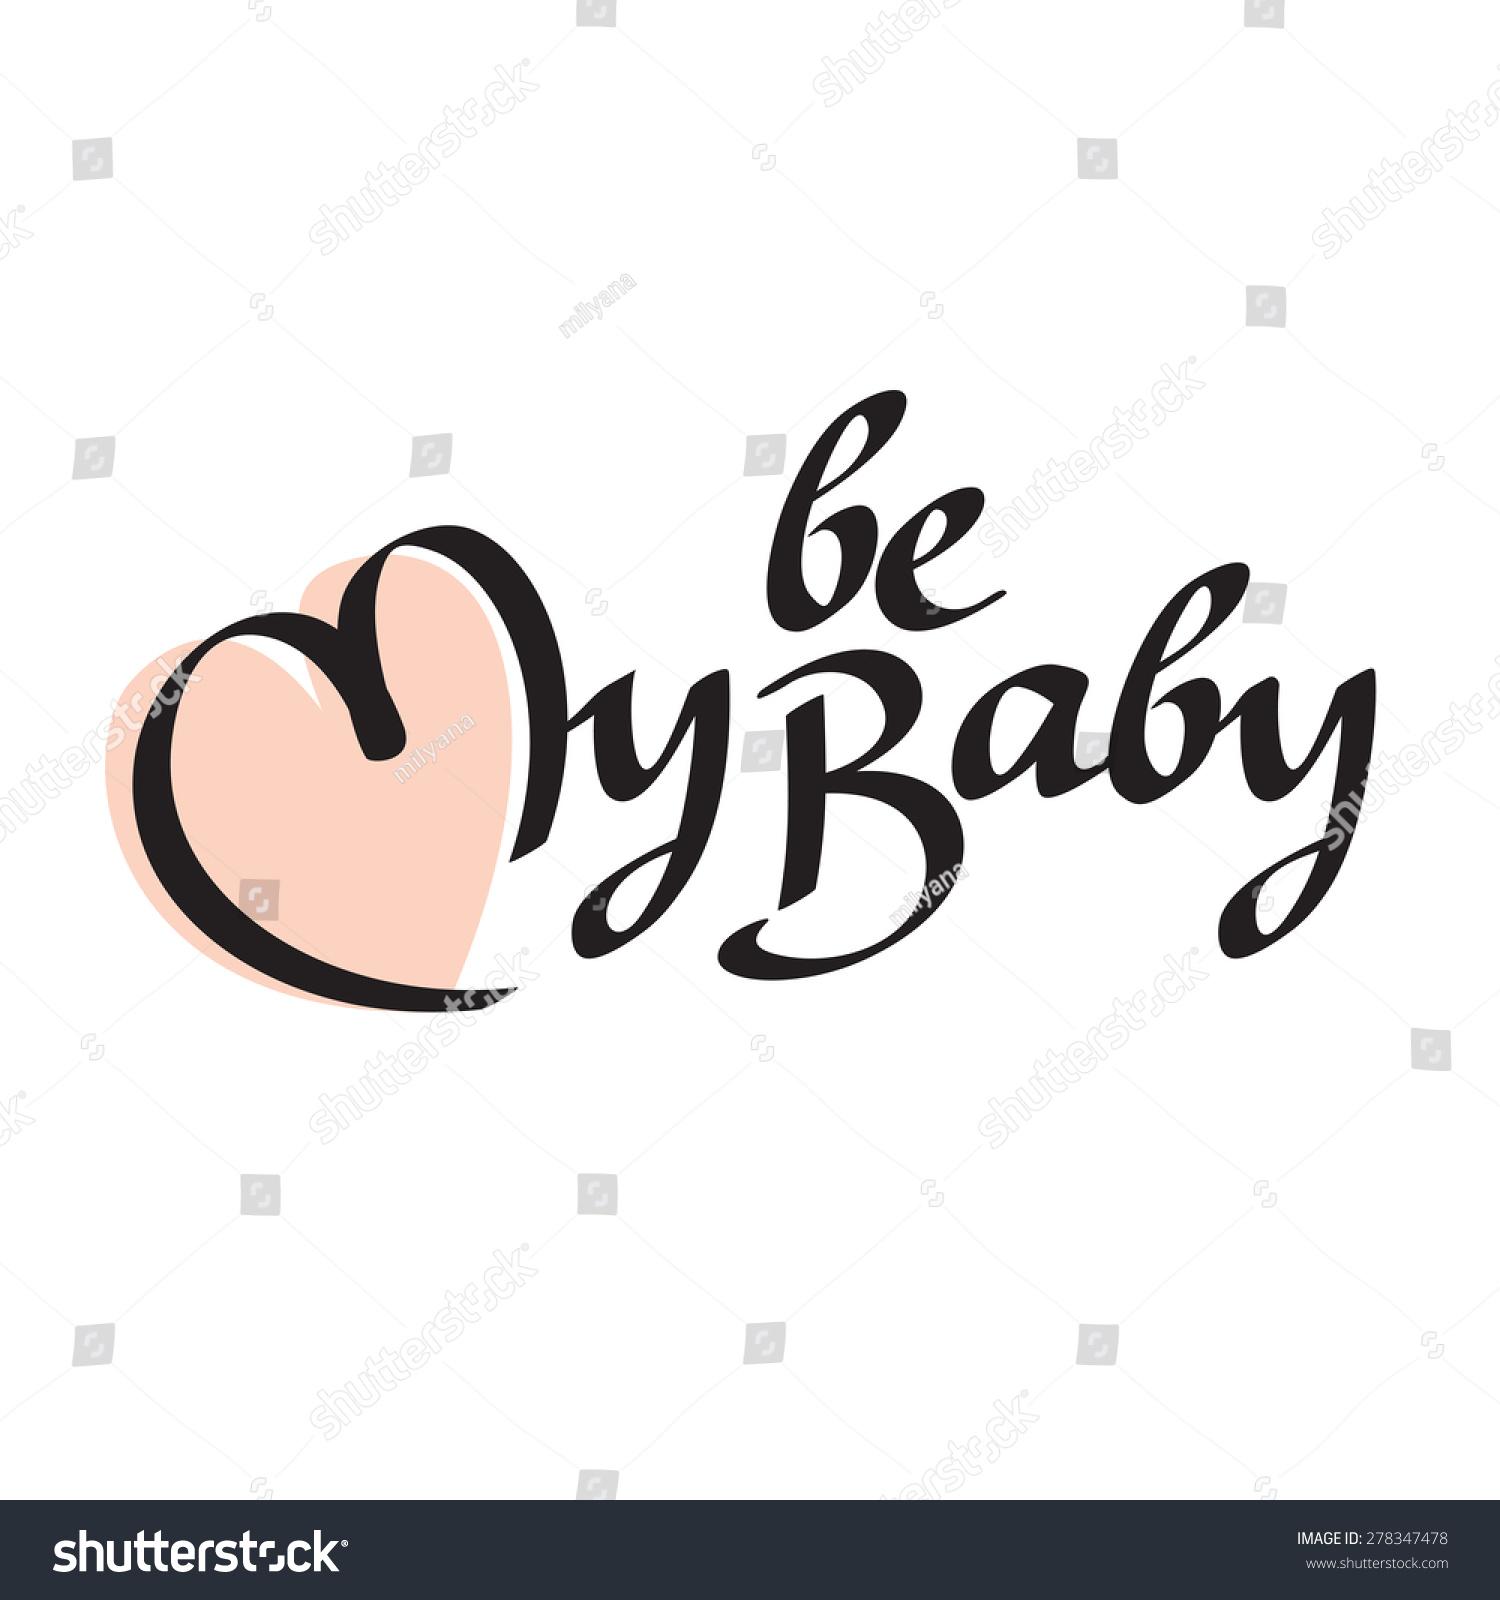 Be my baby text hand lettering stock vektorgrafik